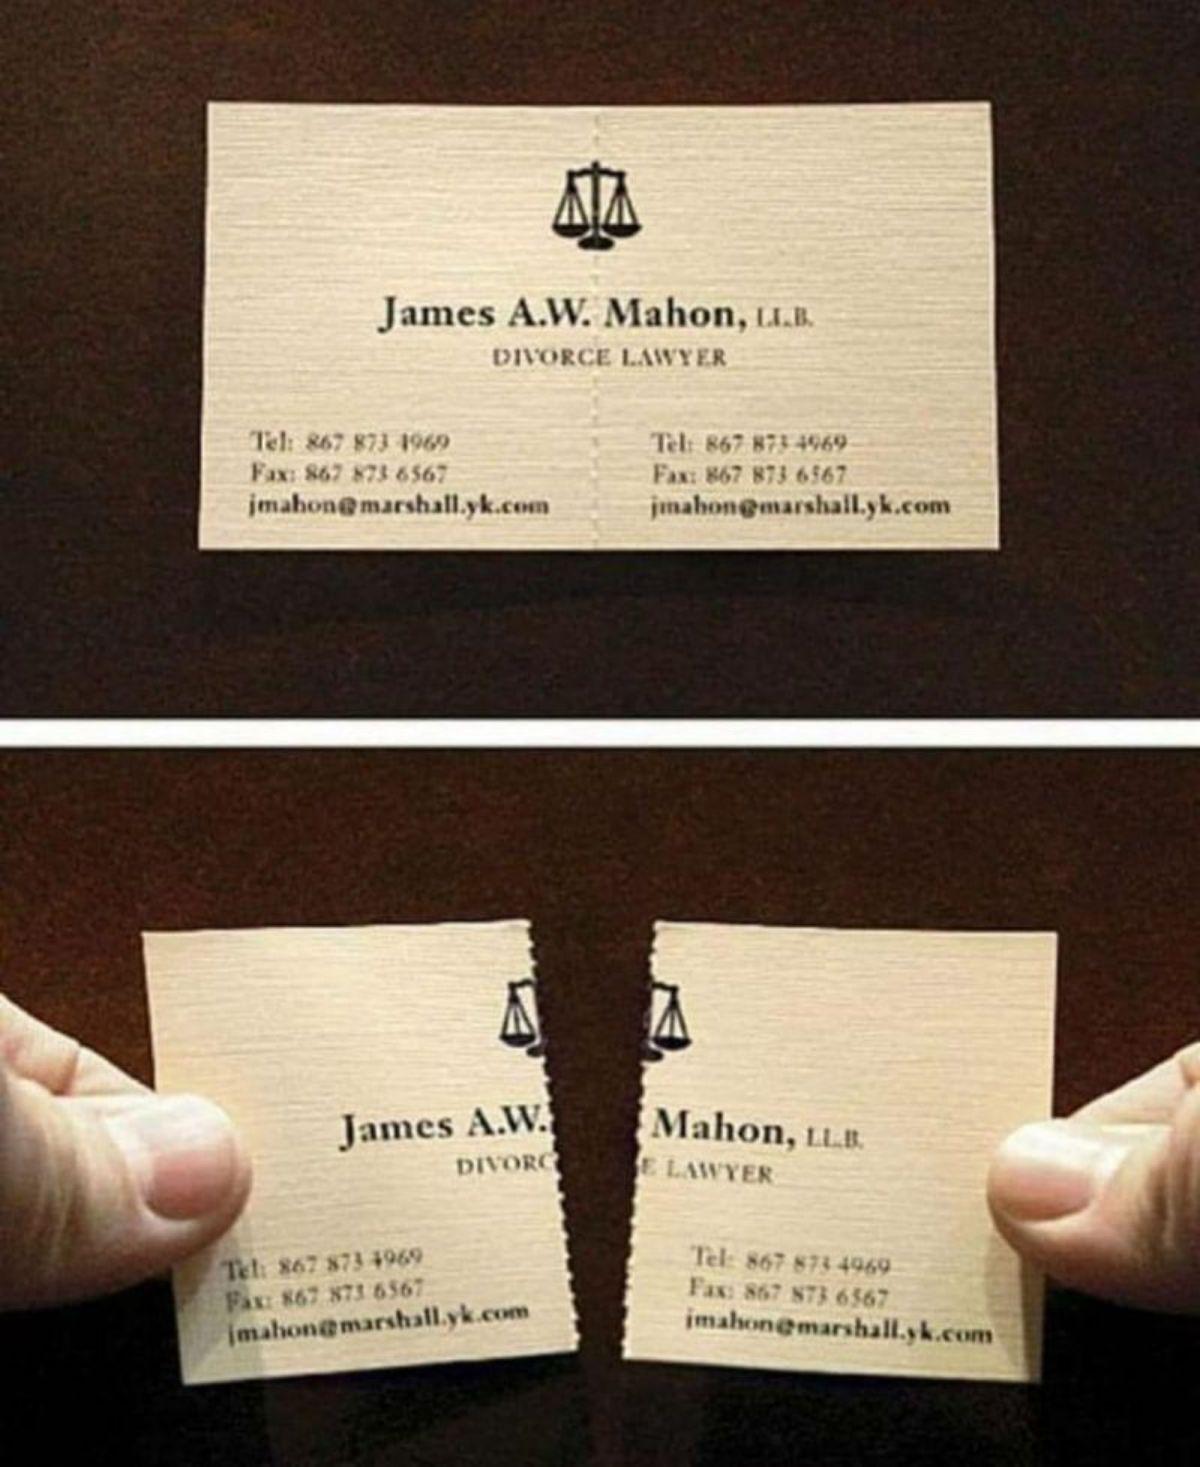 Tarjeta de divorcio divertida